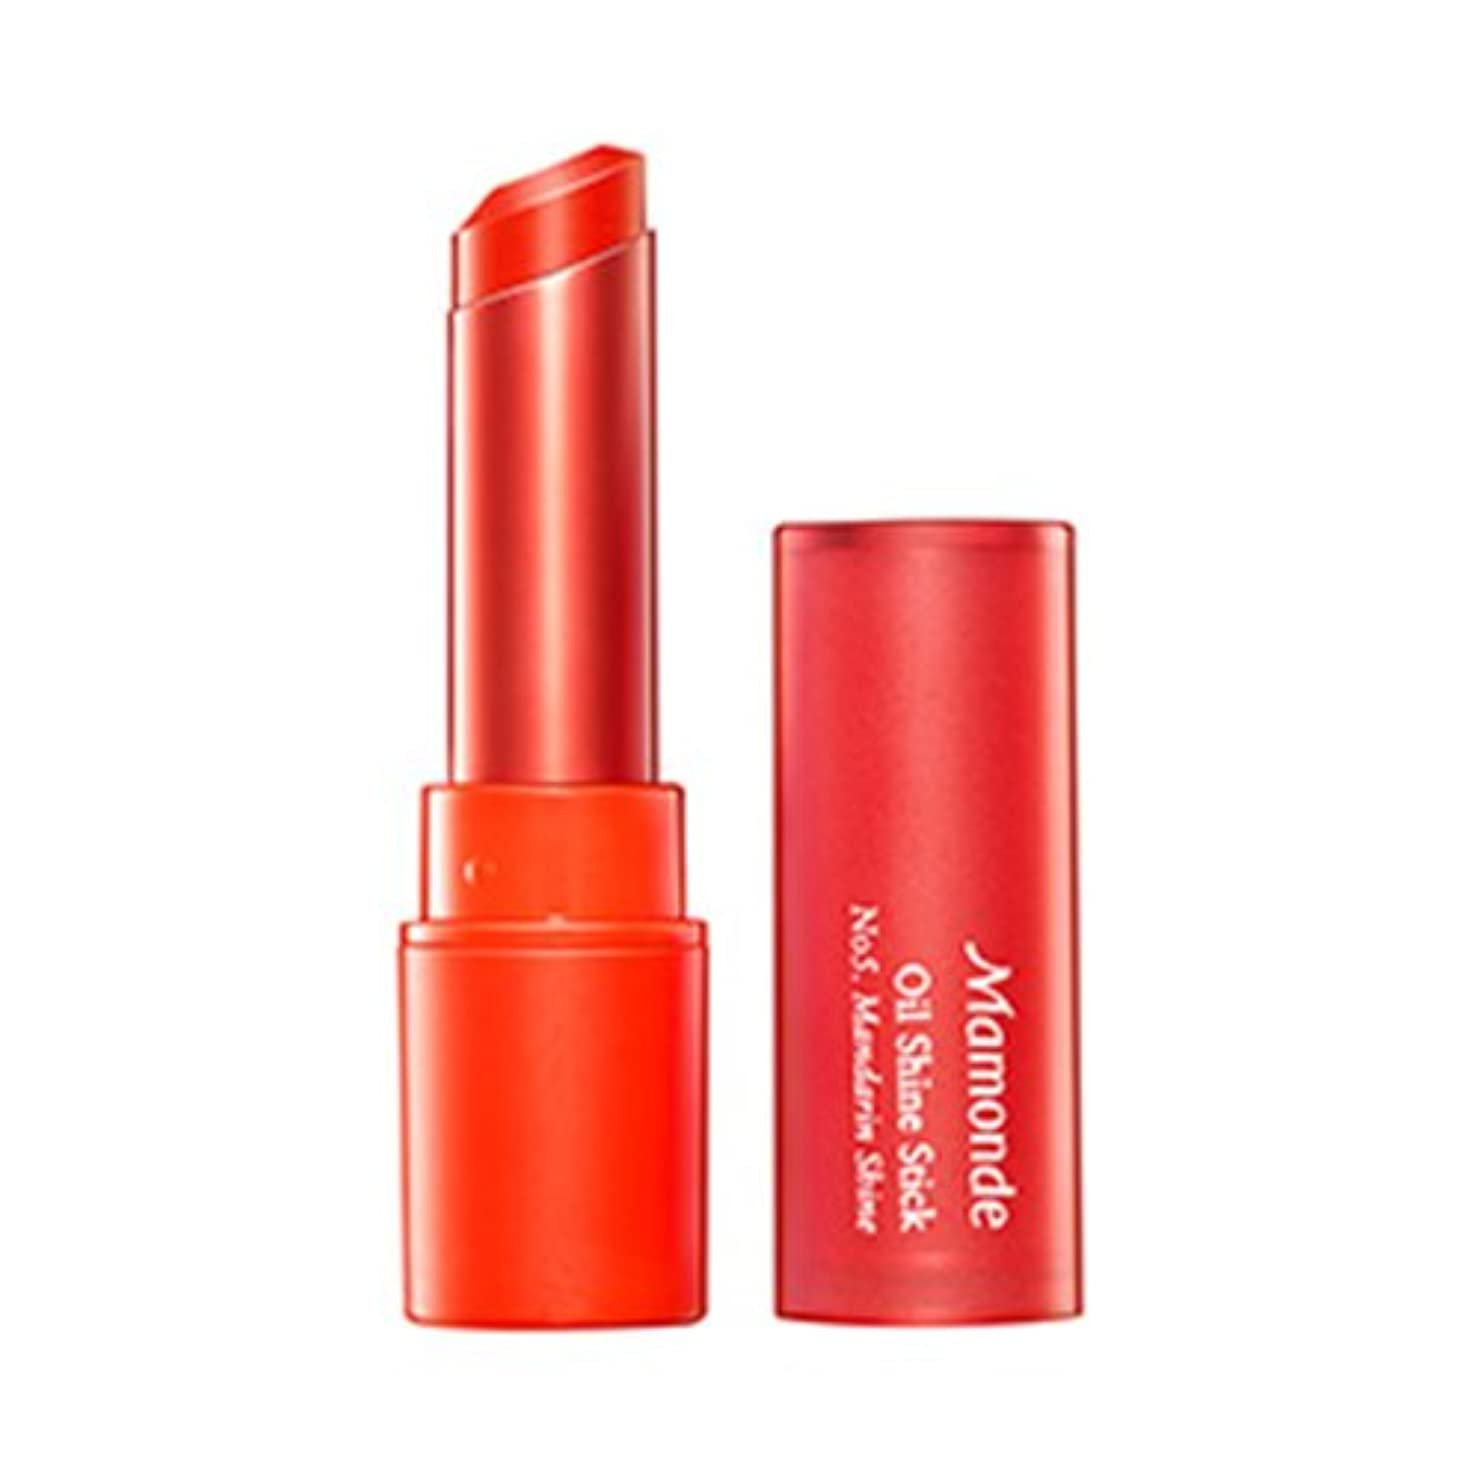 [New] Mamonde Oil Shine Stick 3.4g/マモンド オイル シャイン スティック 3.4g (#5 Mandarine Shine) [並行輸入品]